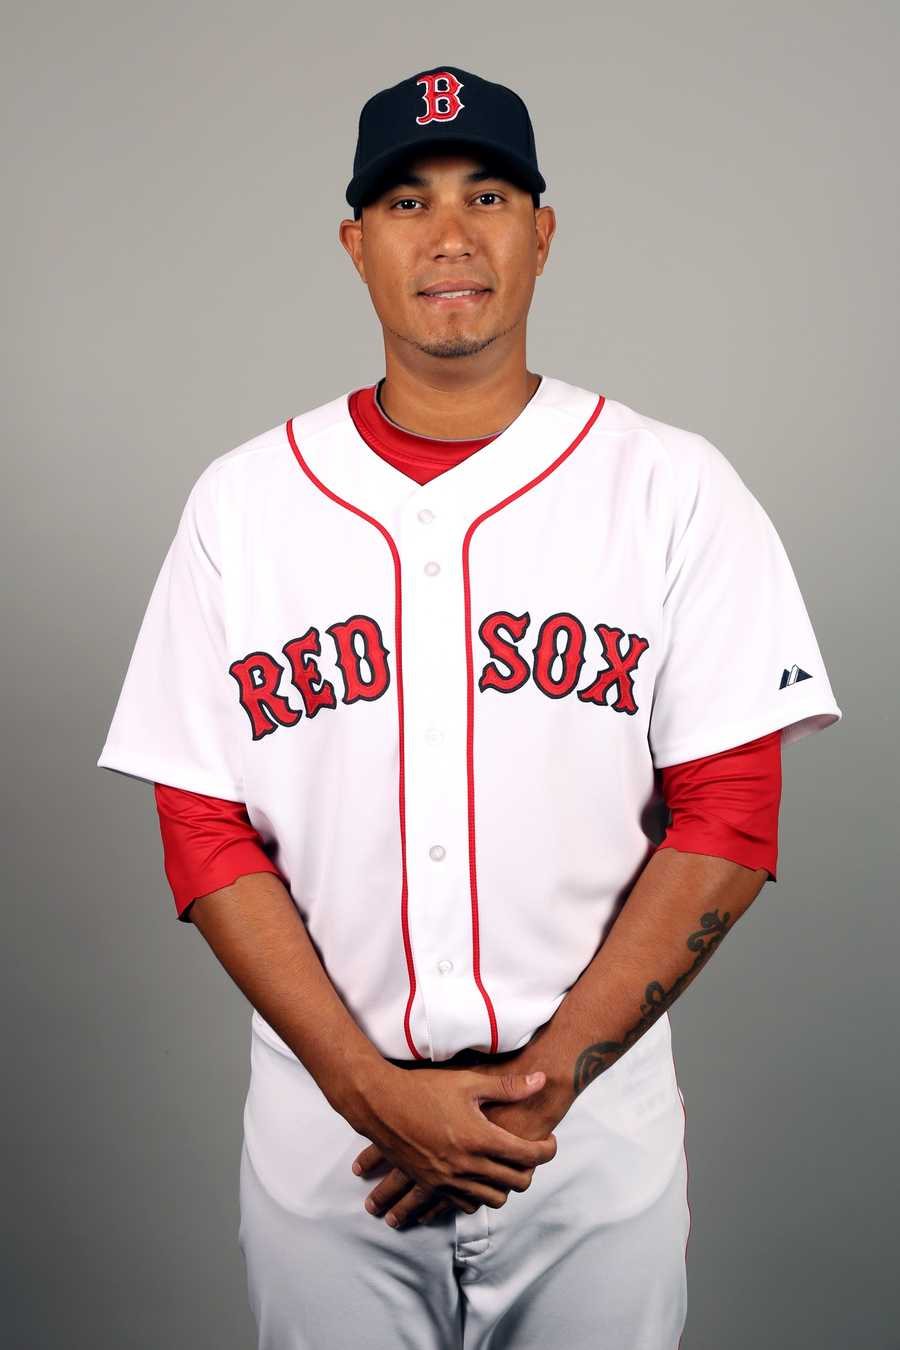 #22 Felix Doubront, pitcher - $586,500